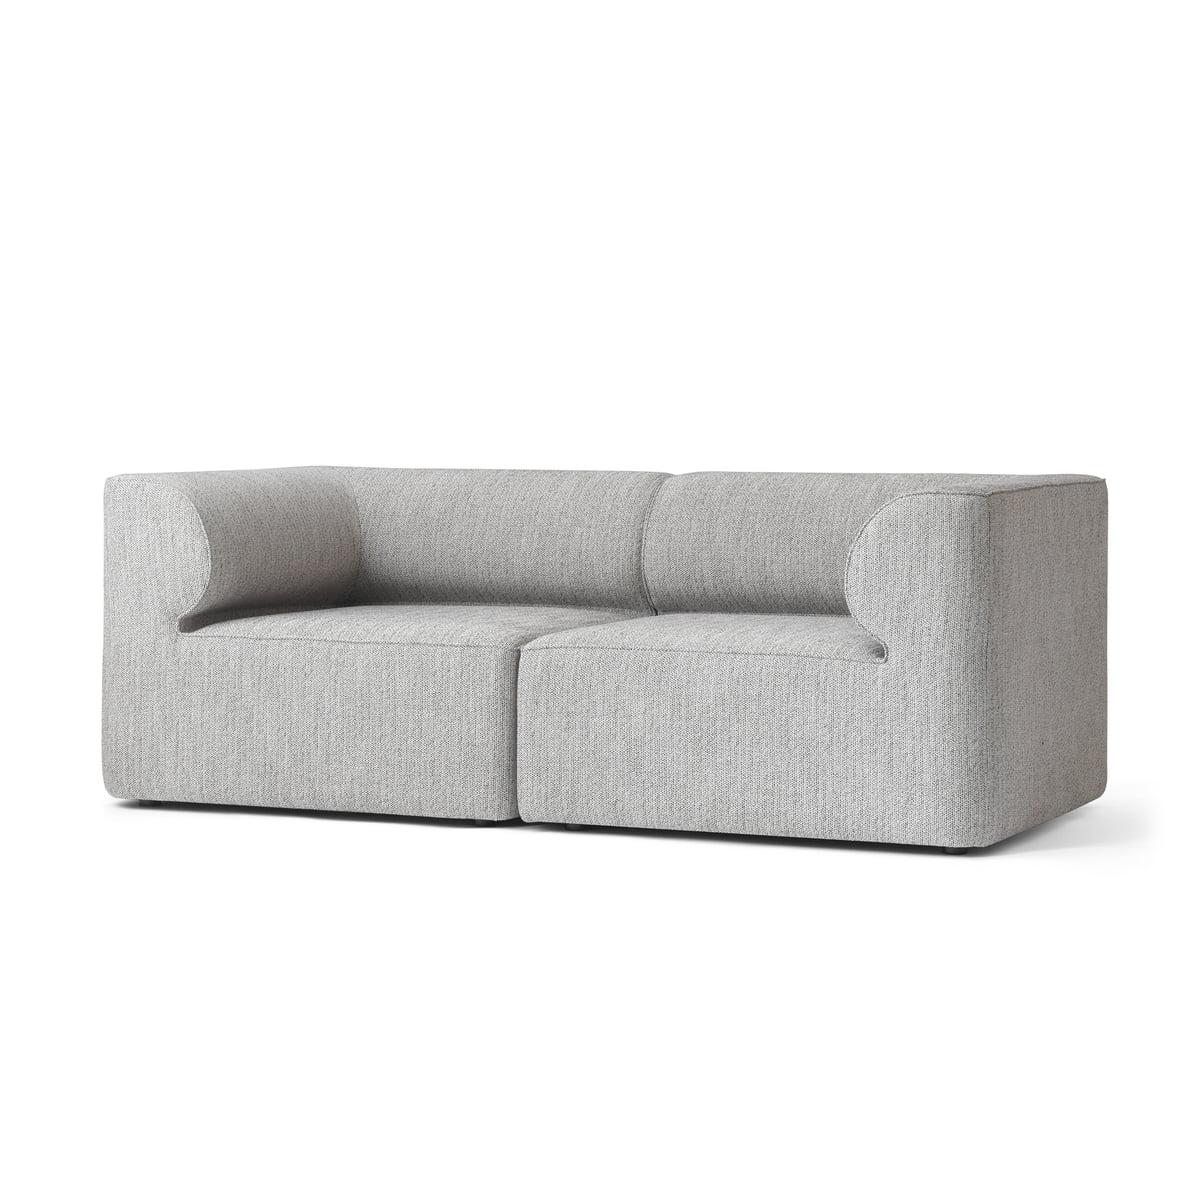 Eave Modular Sofa By Menu Connox